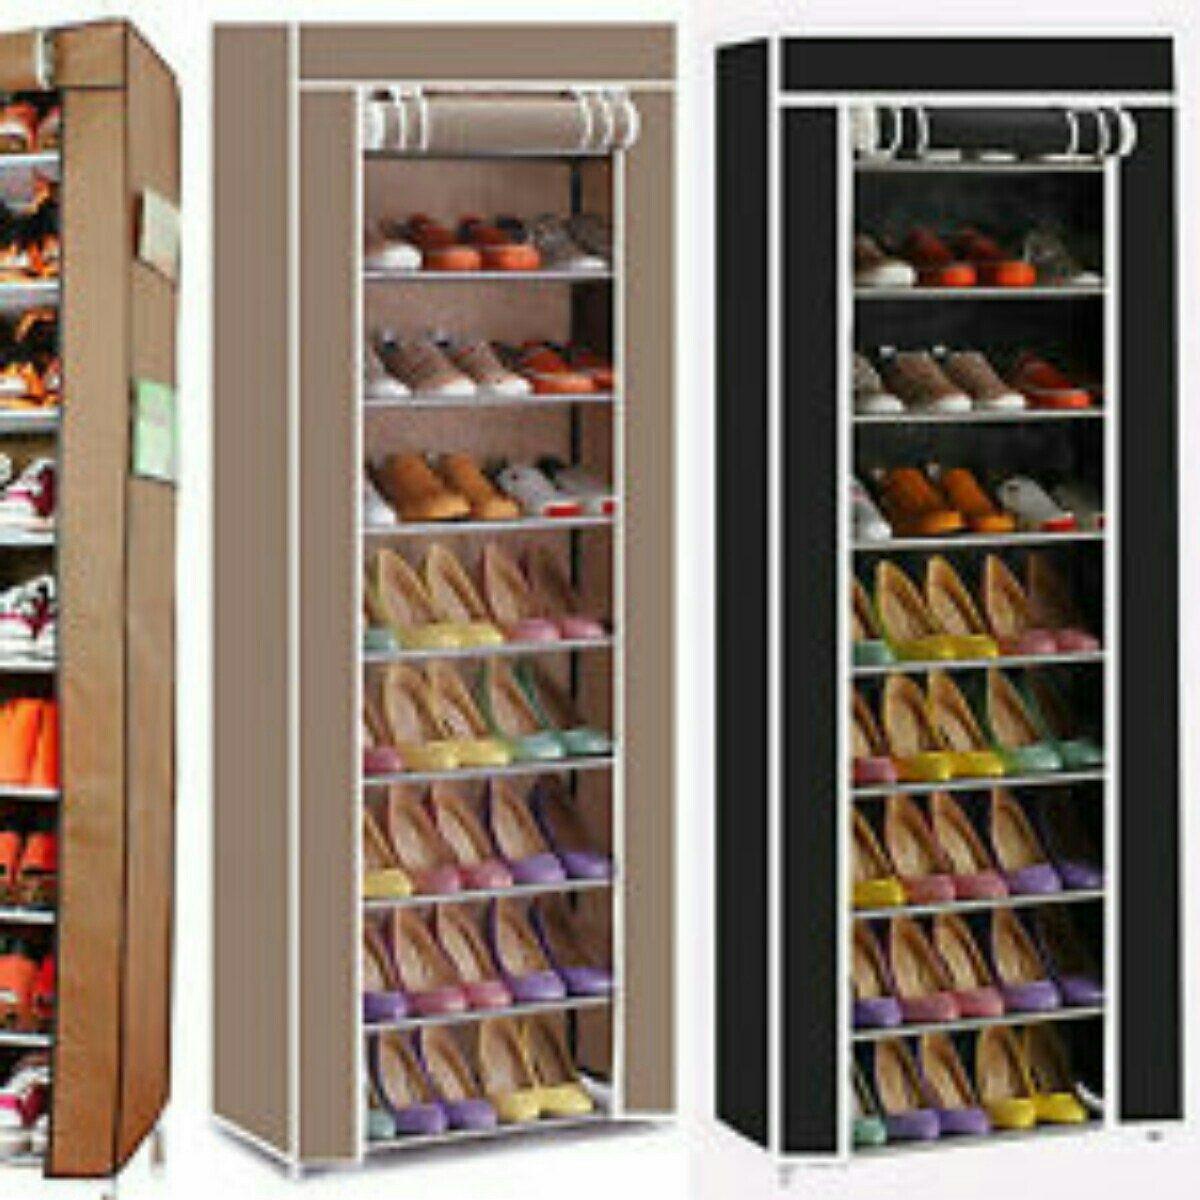 Mueble para zapatos s 70 00 en mercado libre for Muebles para colocar zapatos